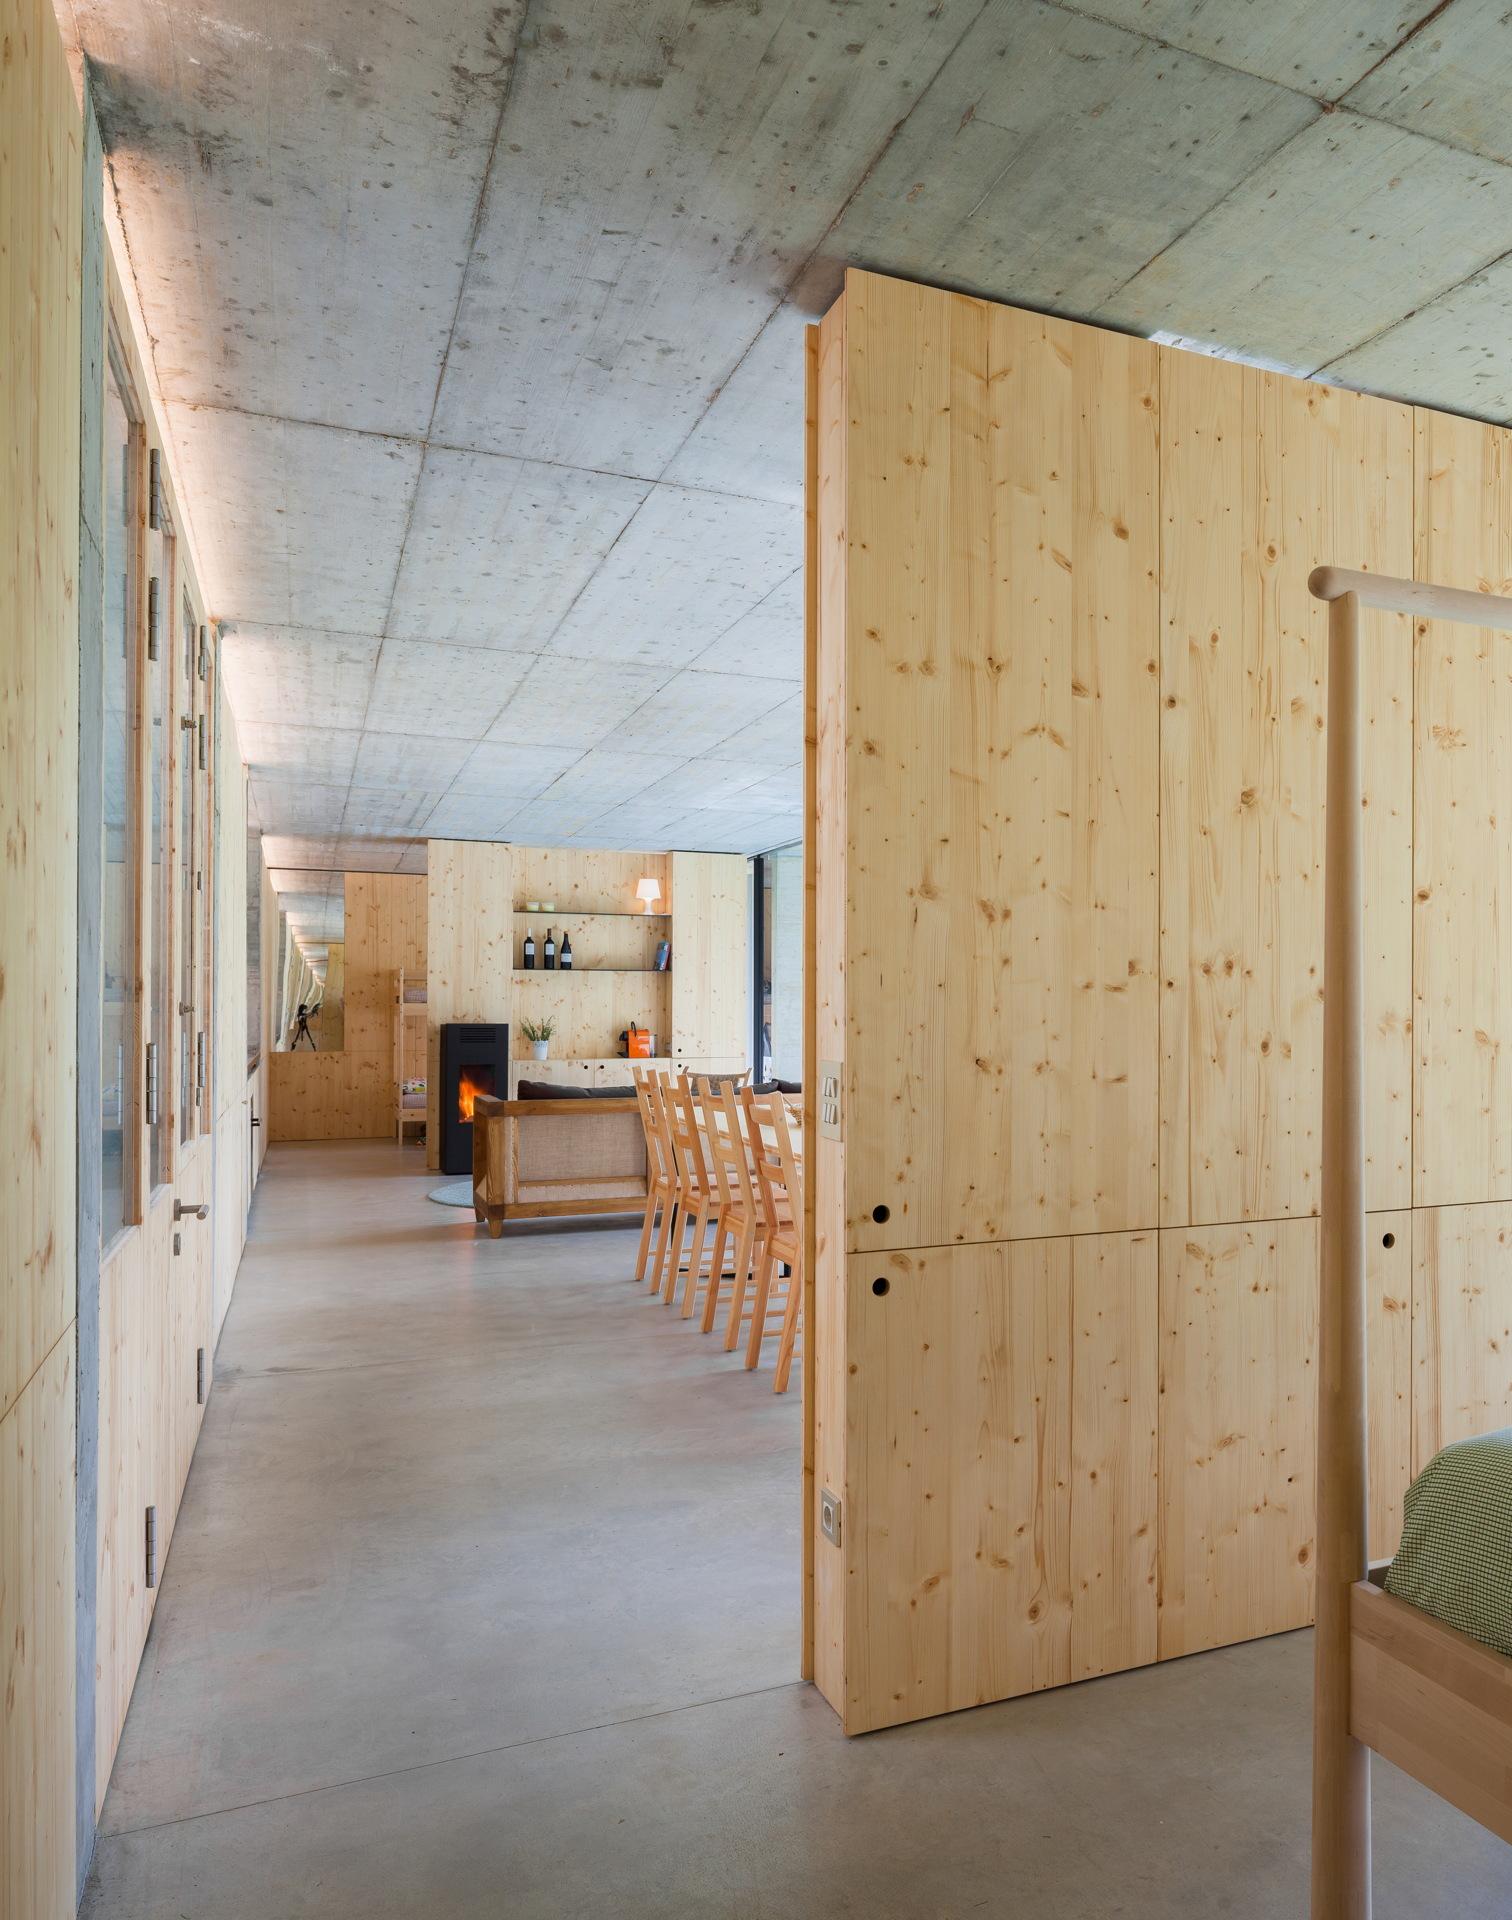 Arnau estudi d'arquitectura: Retina home in Santa Pau, Girona